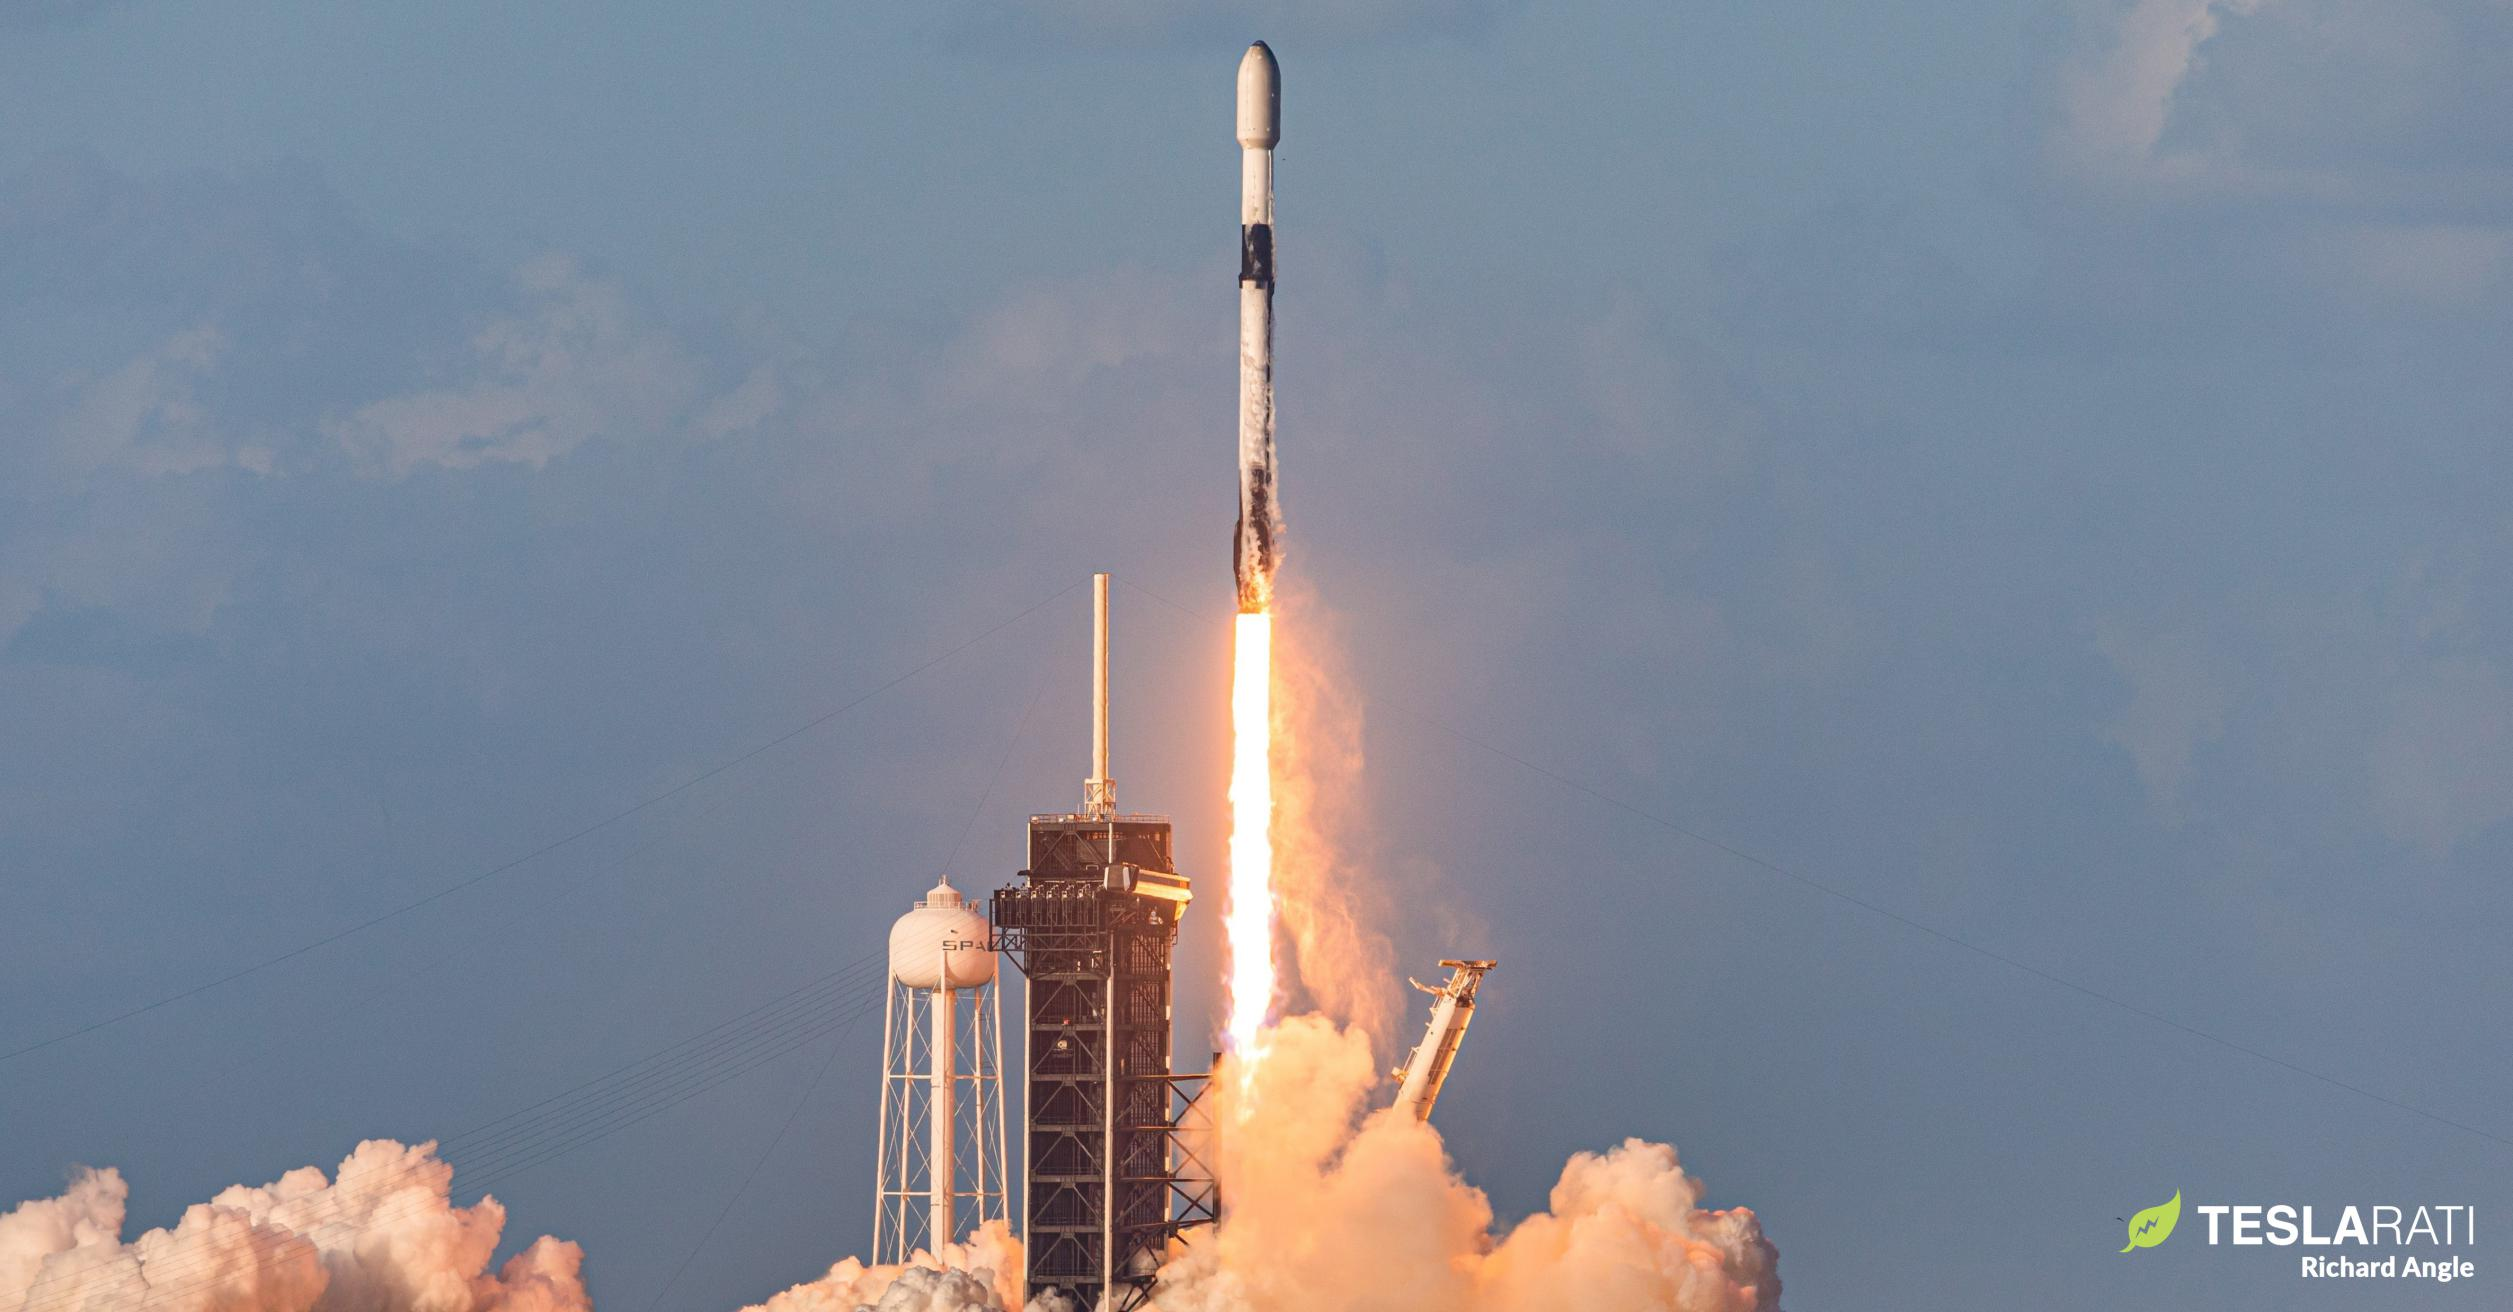 Starlink-26 Falcon 9 B1058 39A 051521 (Richard Angle) 1 crop 2 (c)